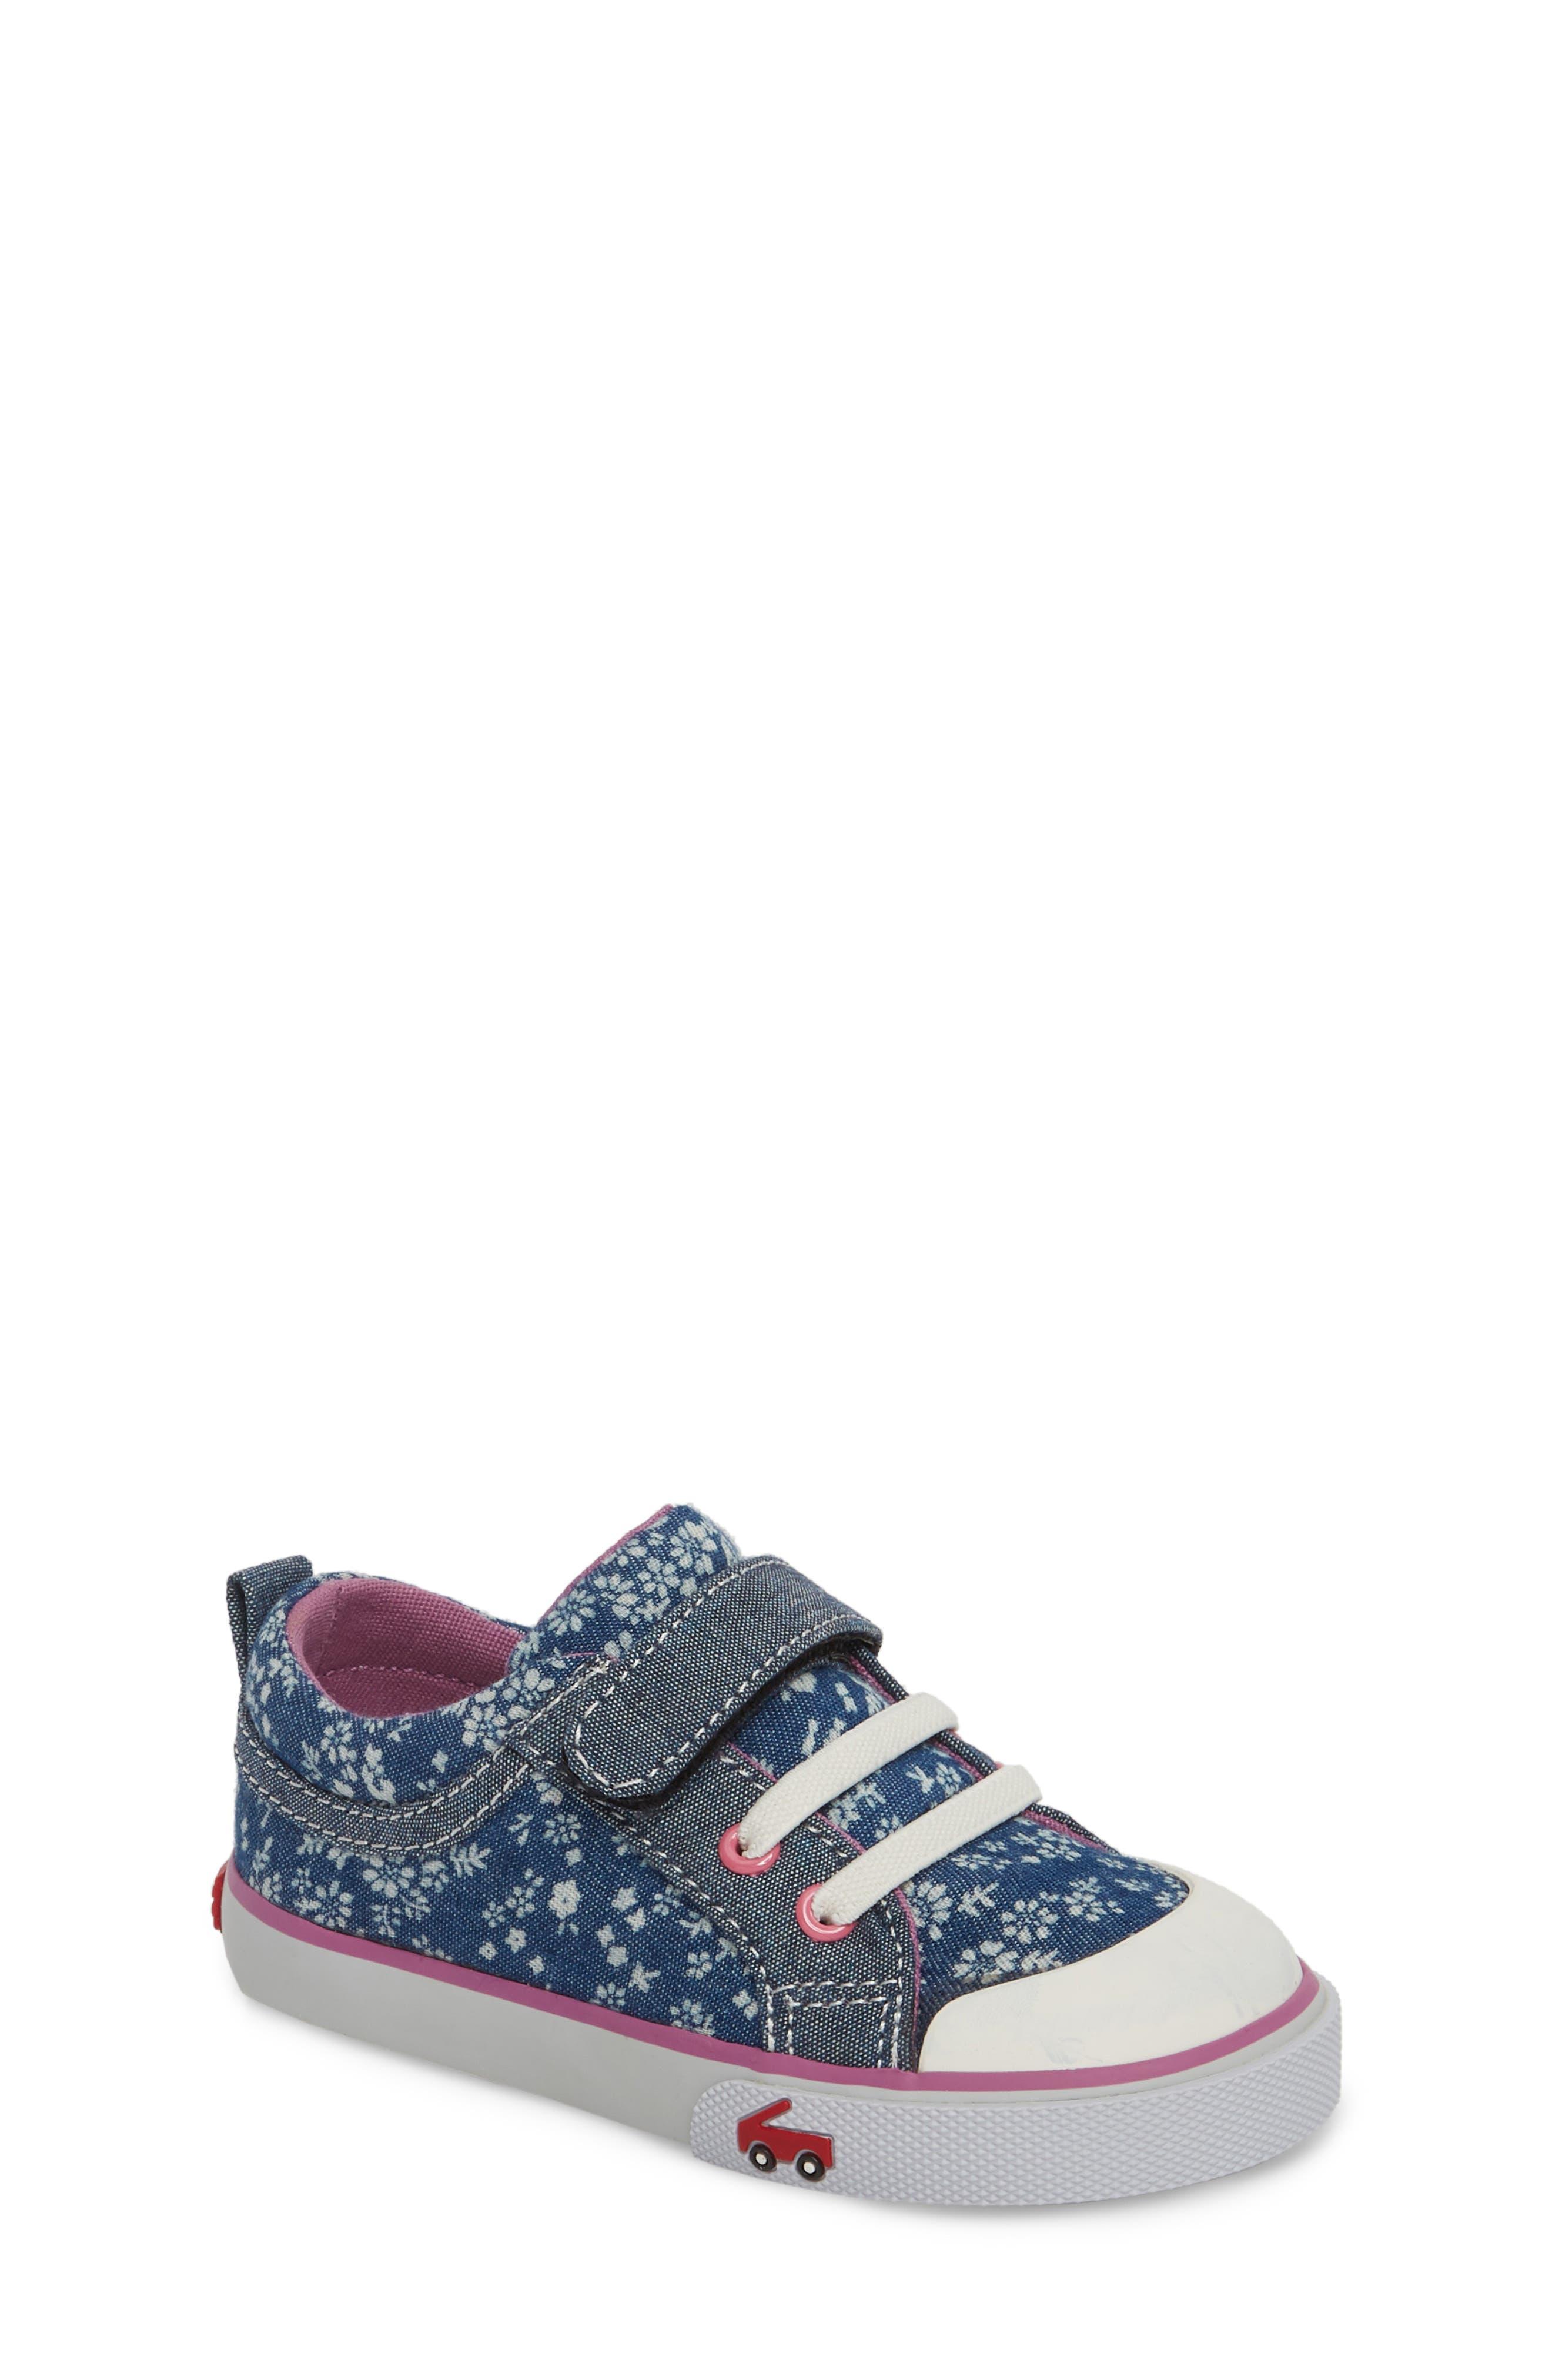 Kristin Sneaker,                         Main,                         color, BLUE FLOWERS